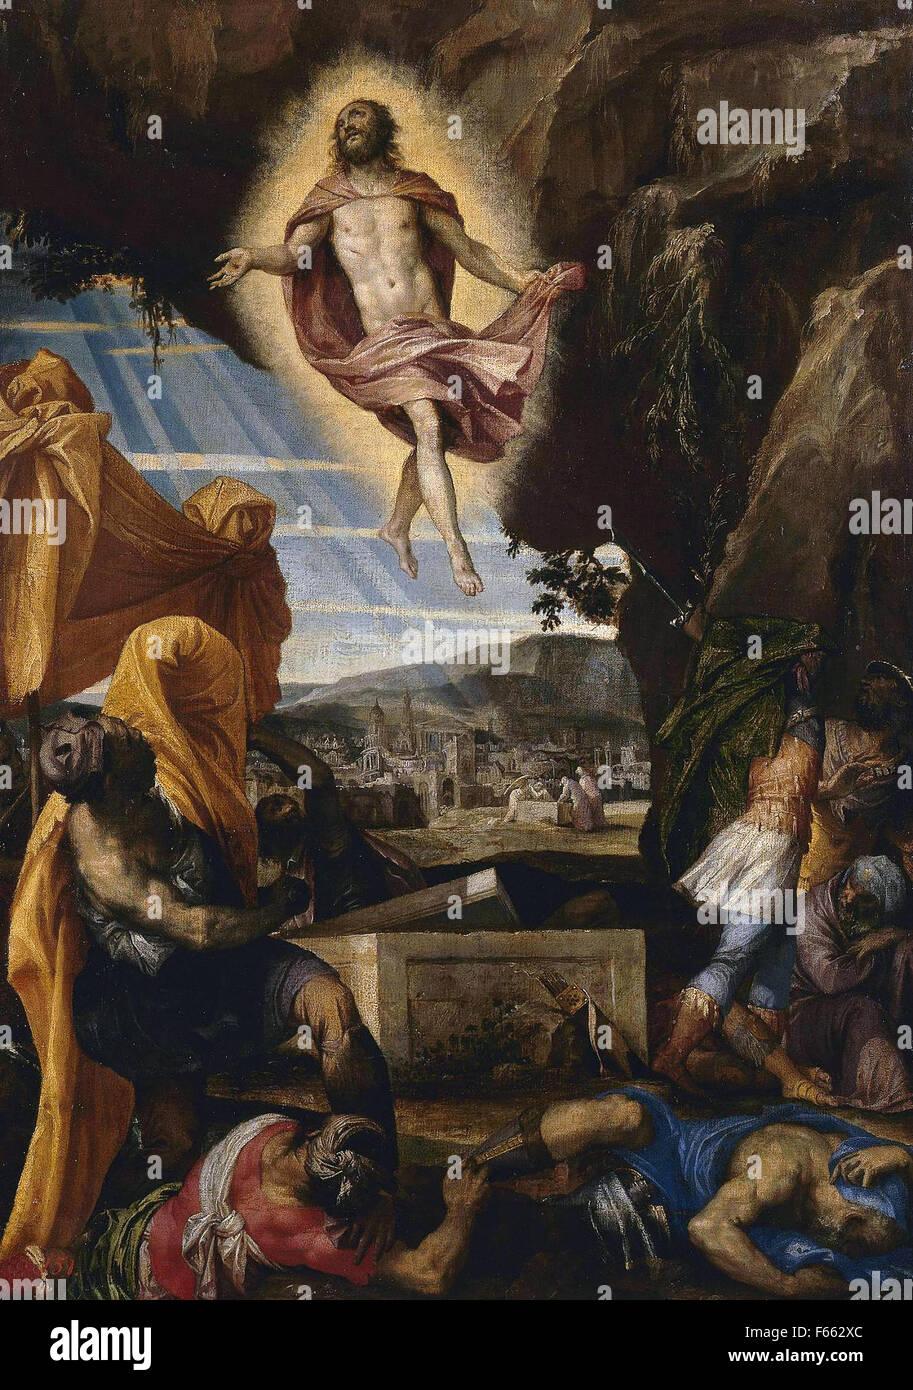 Paolo Veronese - Resurrection of Christ - Stock Image